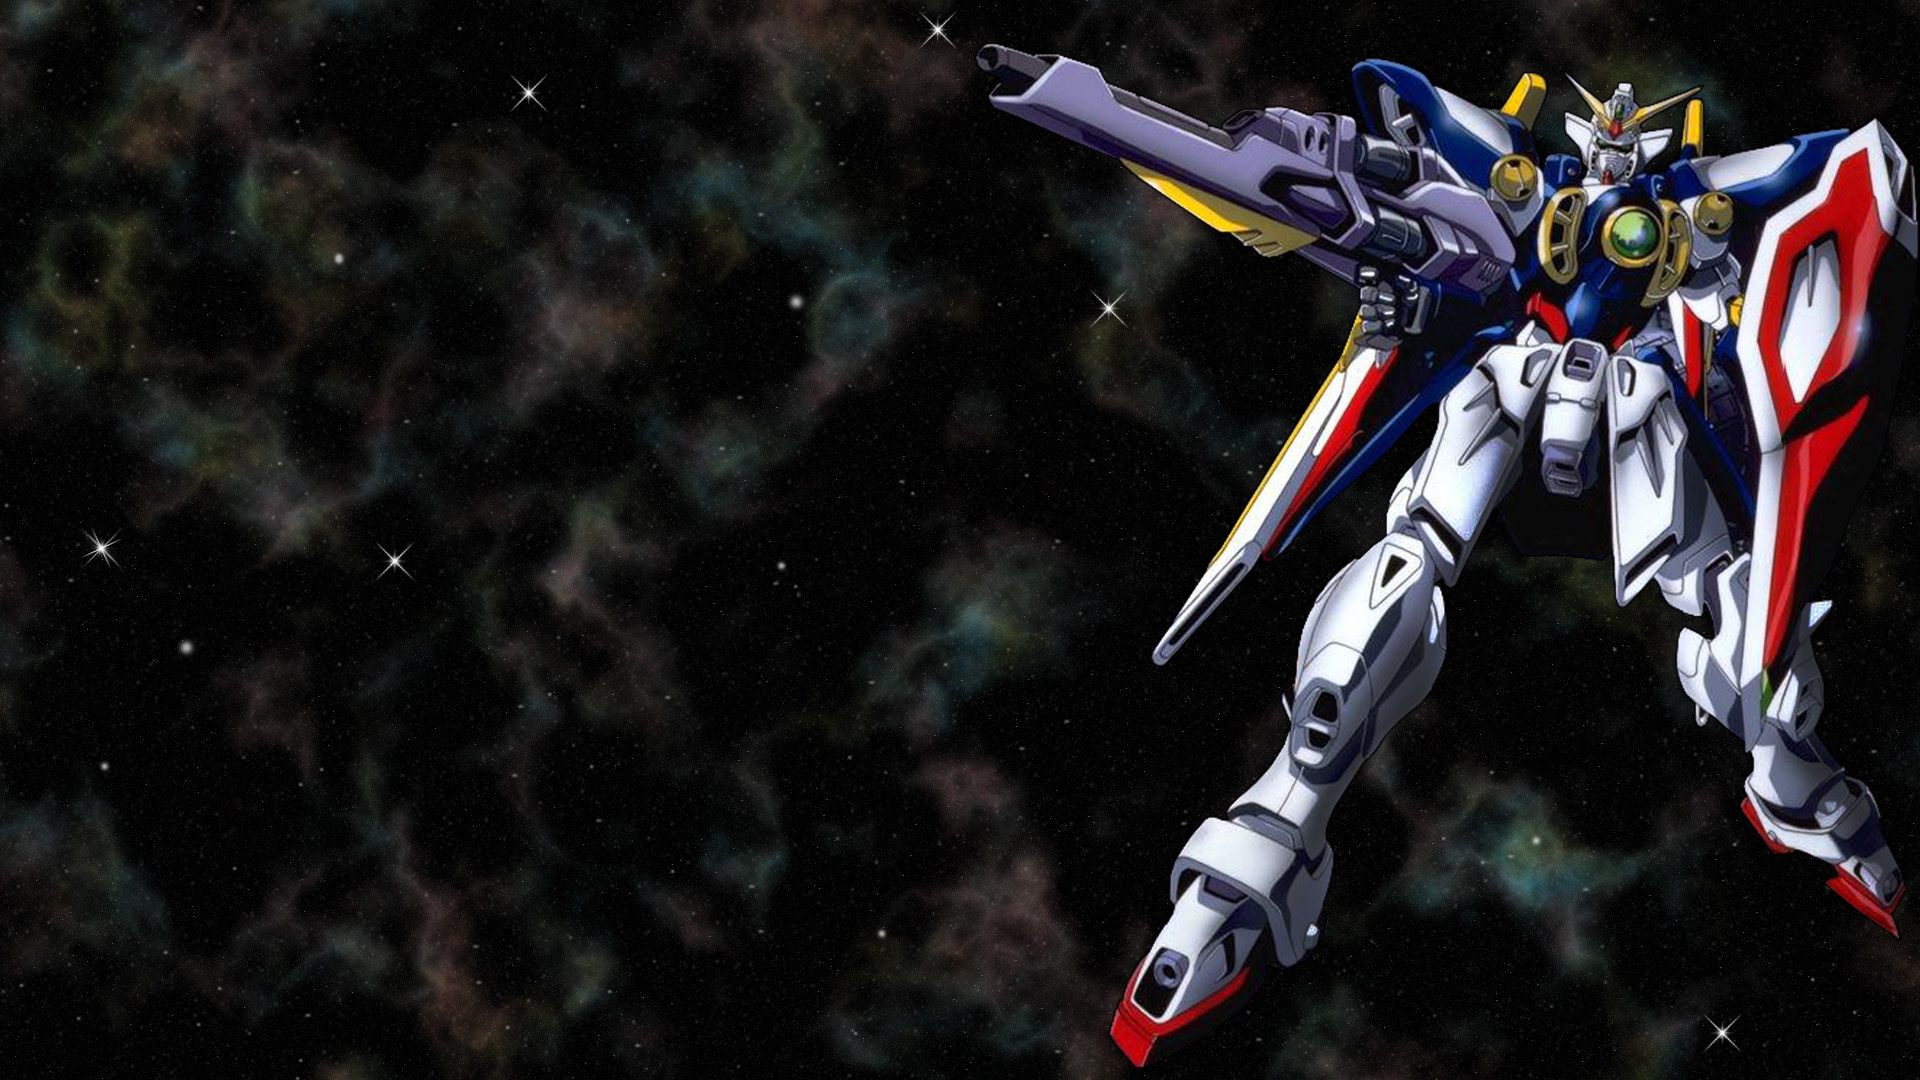 Gundam Wing wallpaper 21323 1920x1080